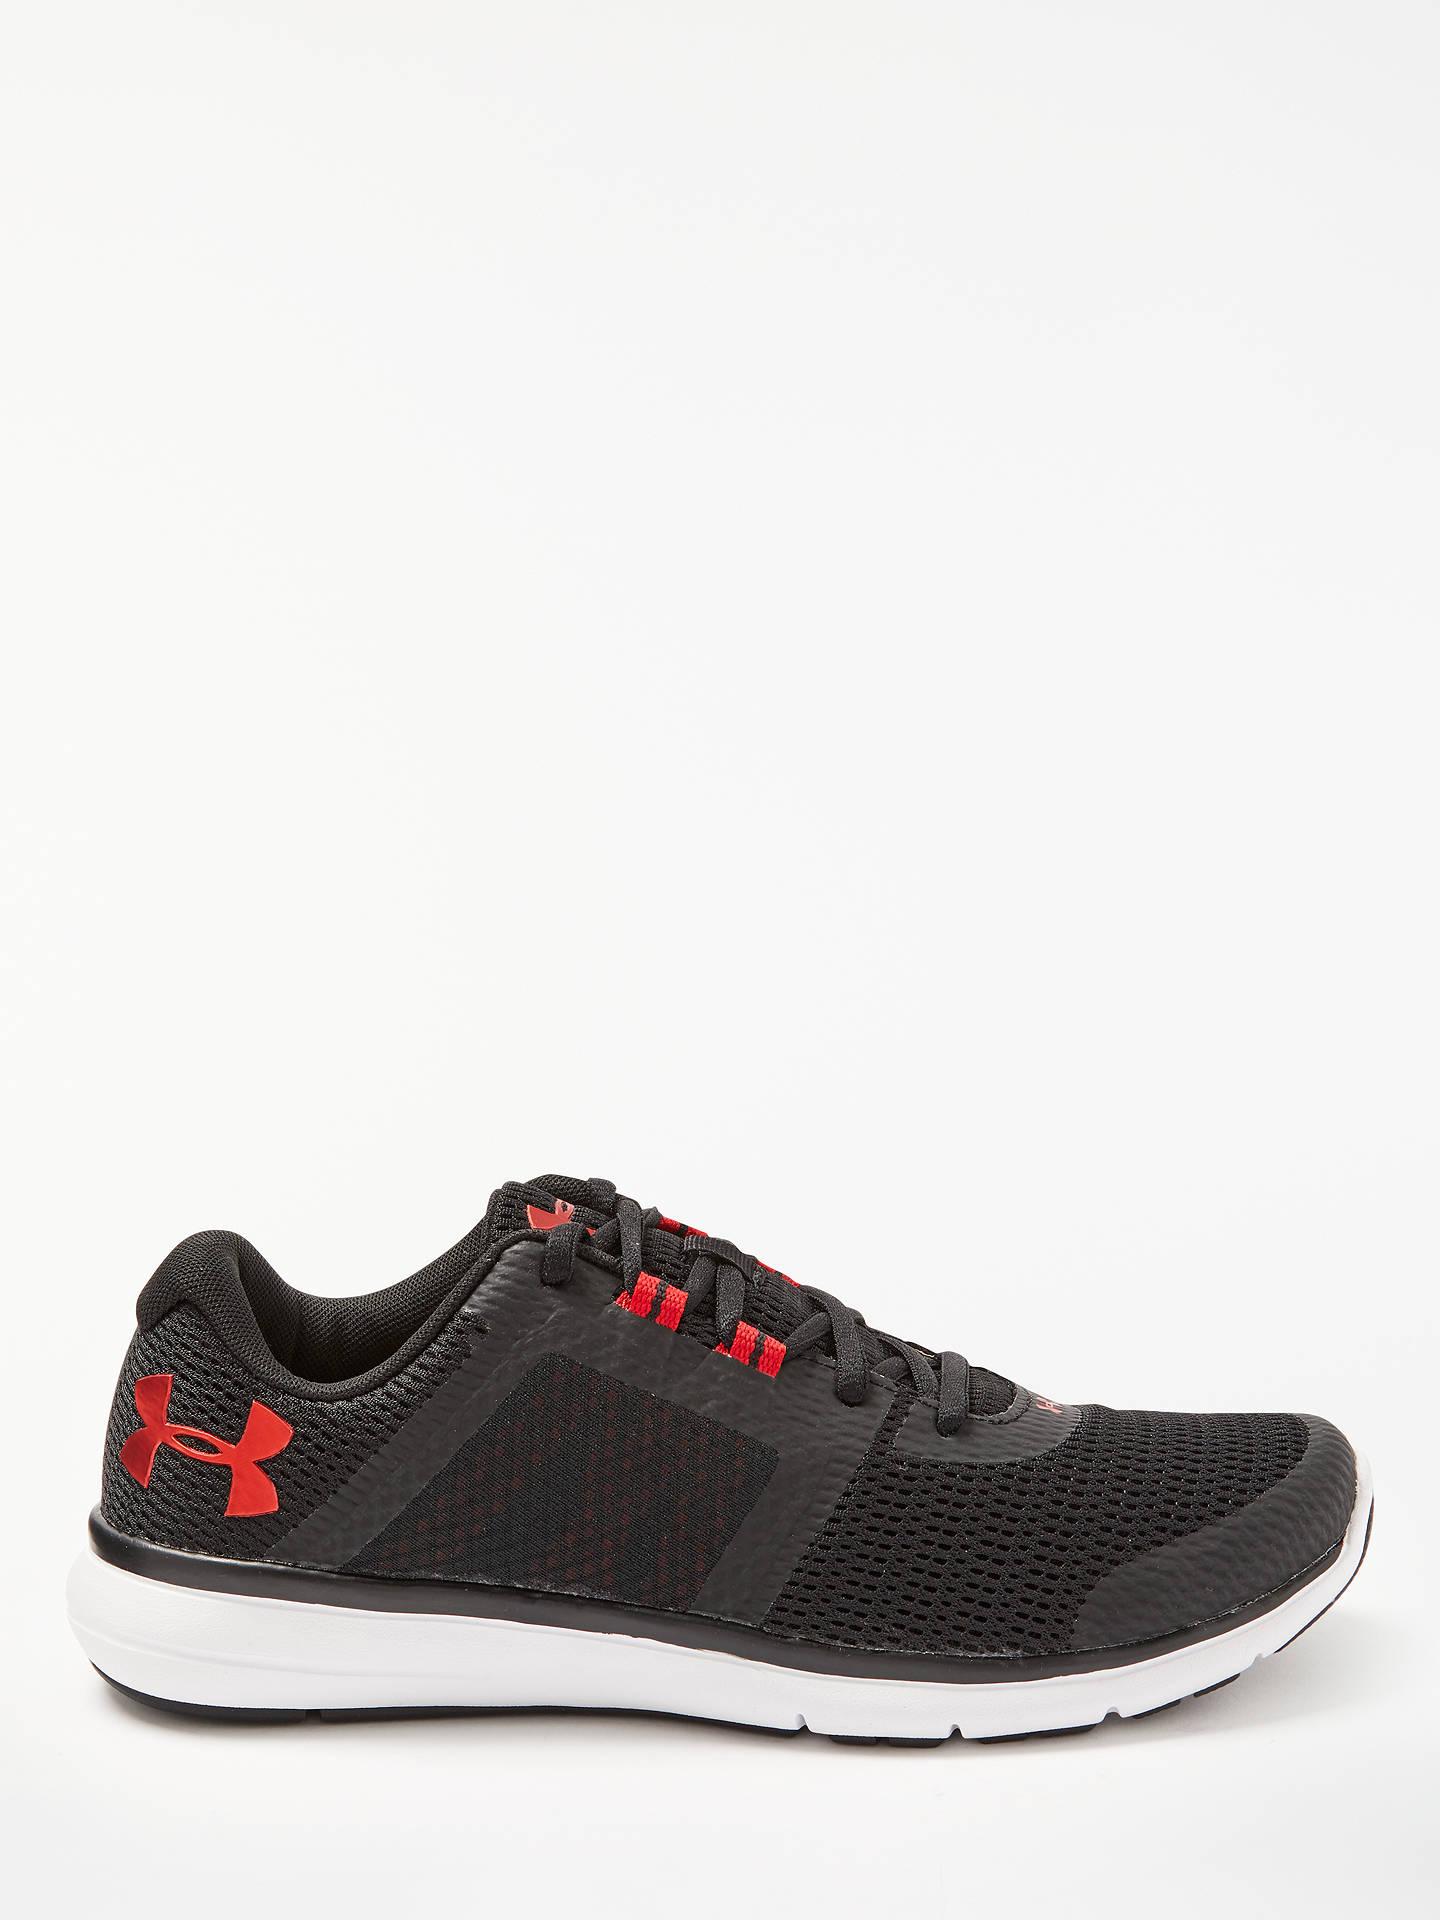 Under Armour Fuse FST Men's Running Shoes, BlackGreyWhite